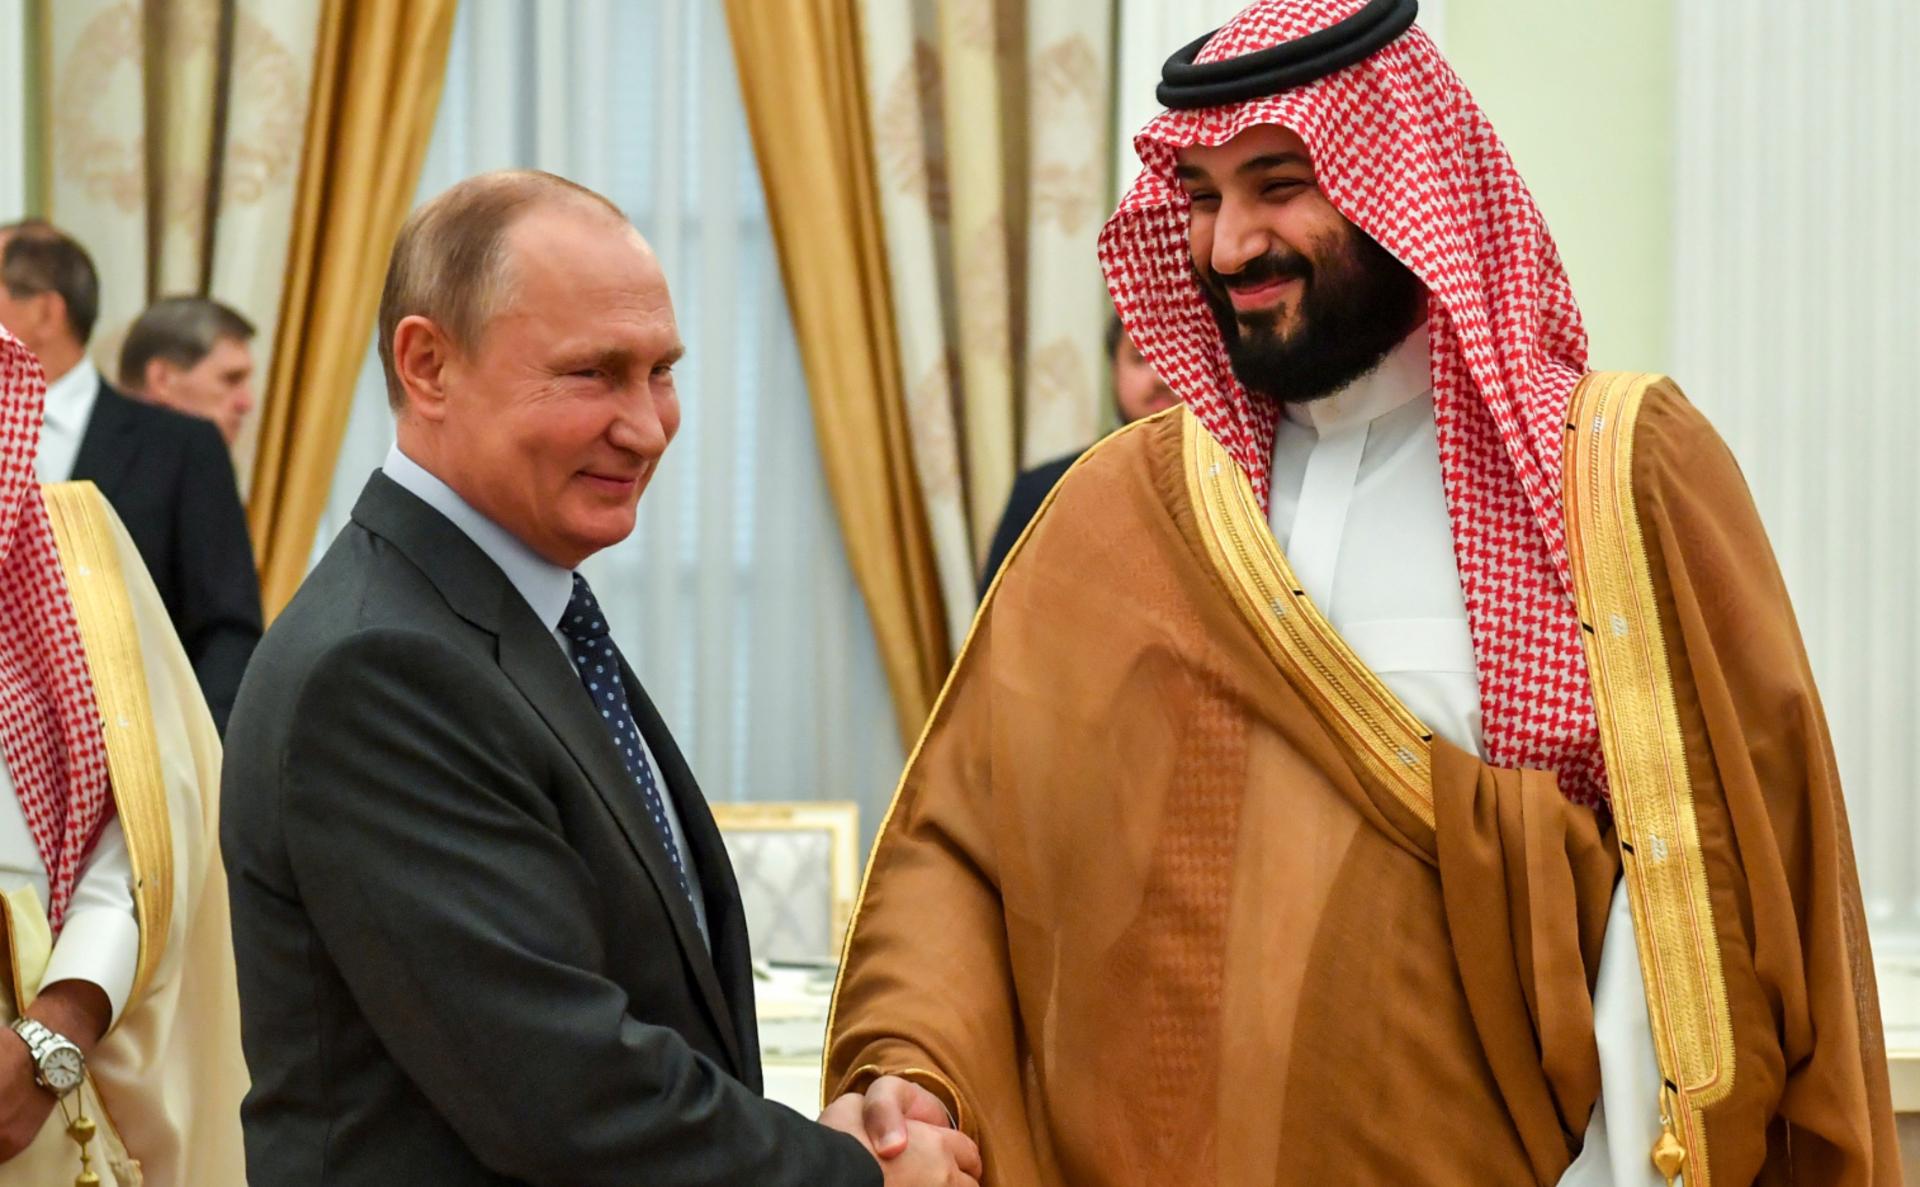 Принц Мухаммед бен Салман Аль Сауд и президент России Владимир Путин